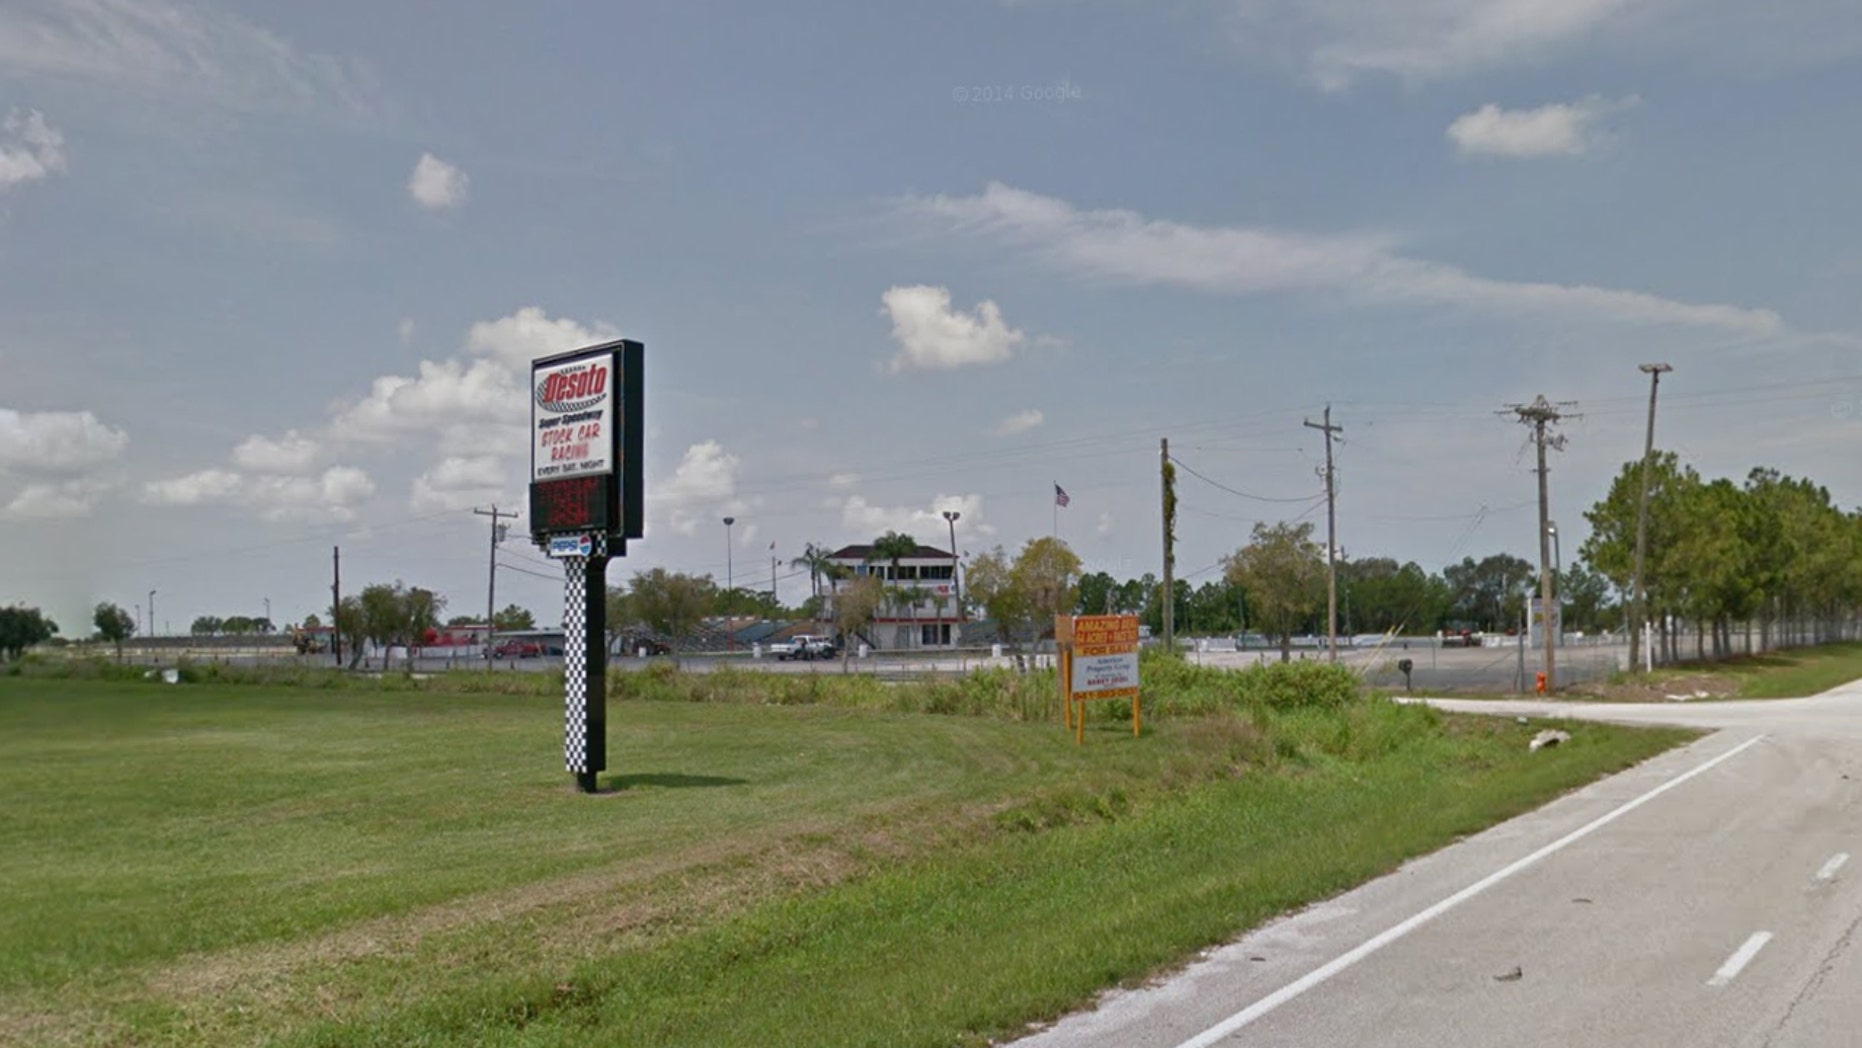 Desoto Speedway in Bradenton, Florida.